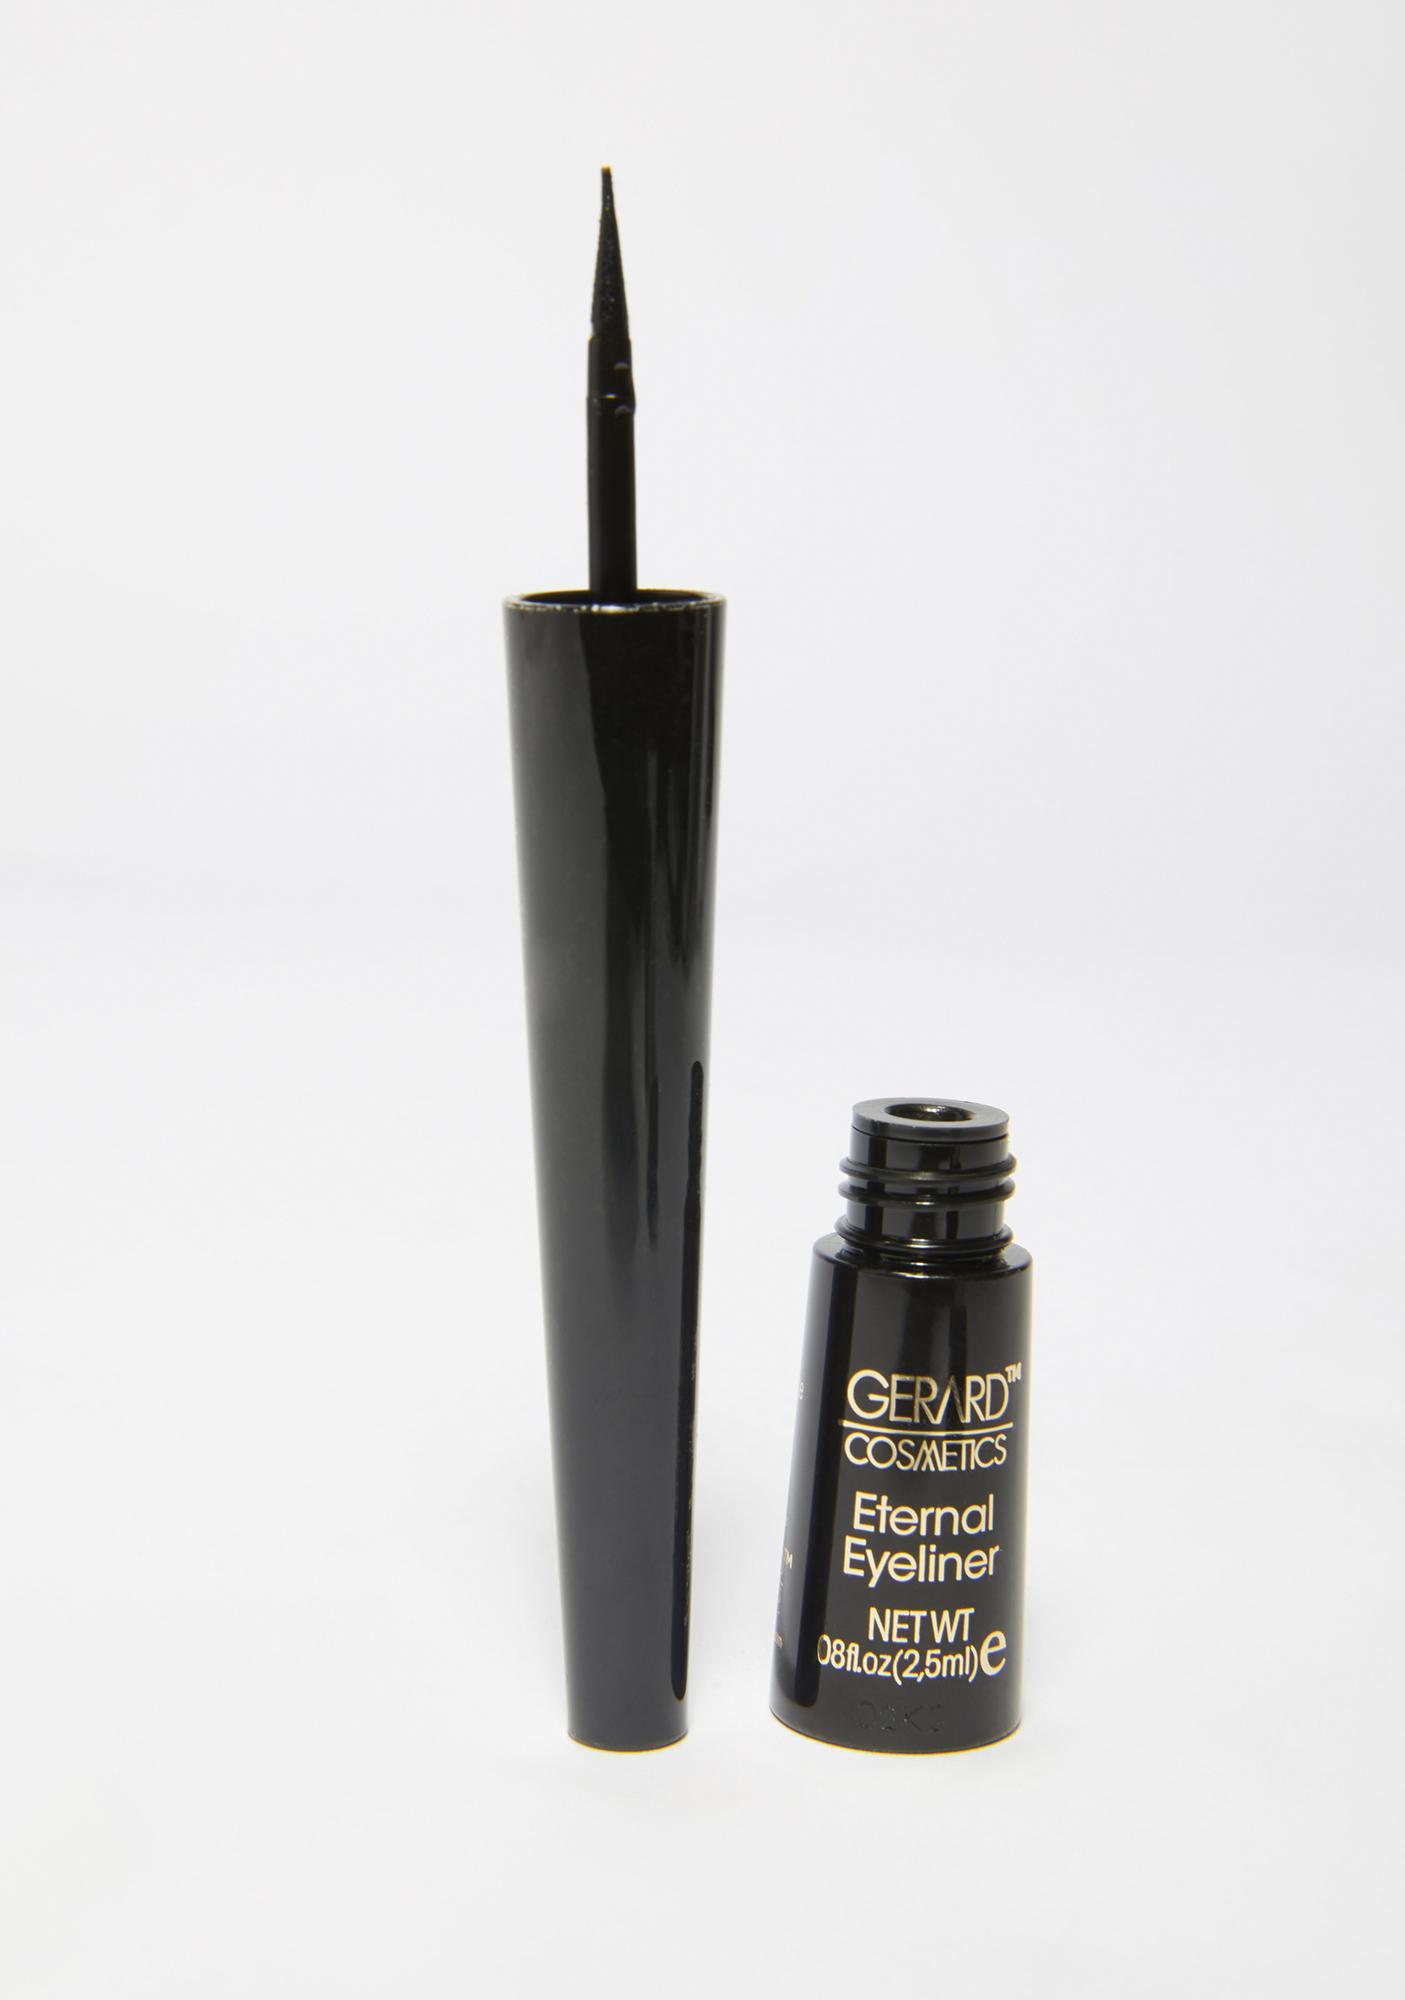 Gerard Cosmetics Eternal Eyeliner